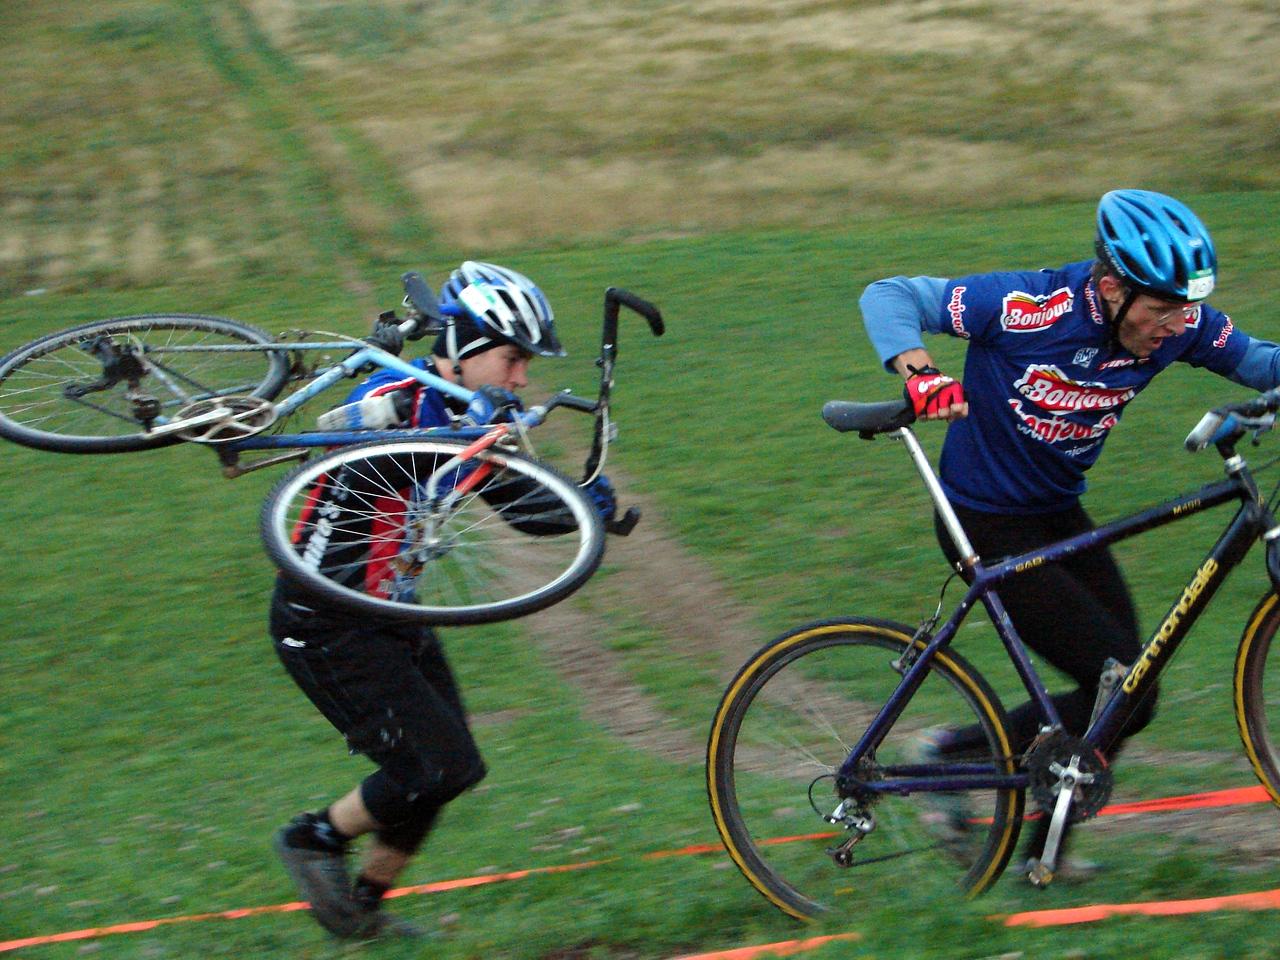 Frank carrying his frankenbike adventure racing style!